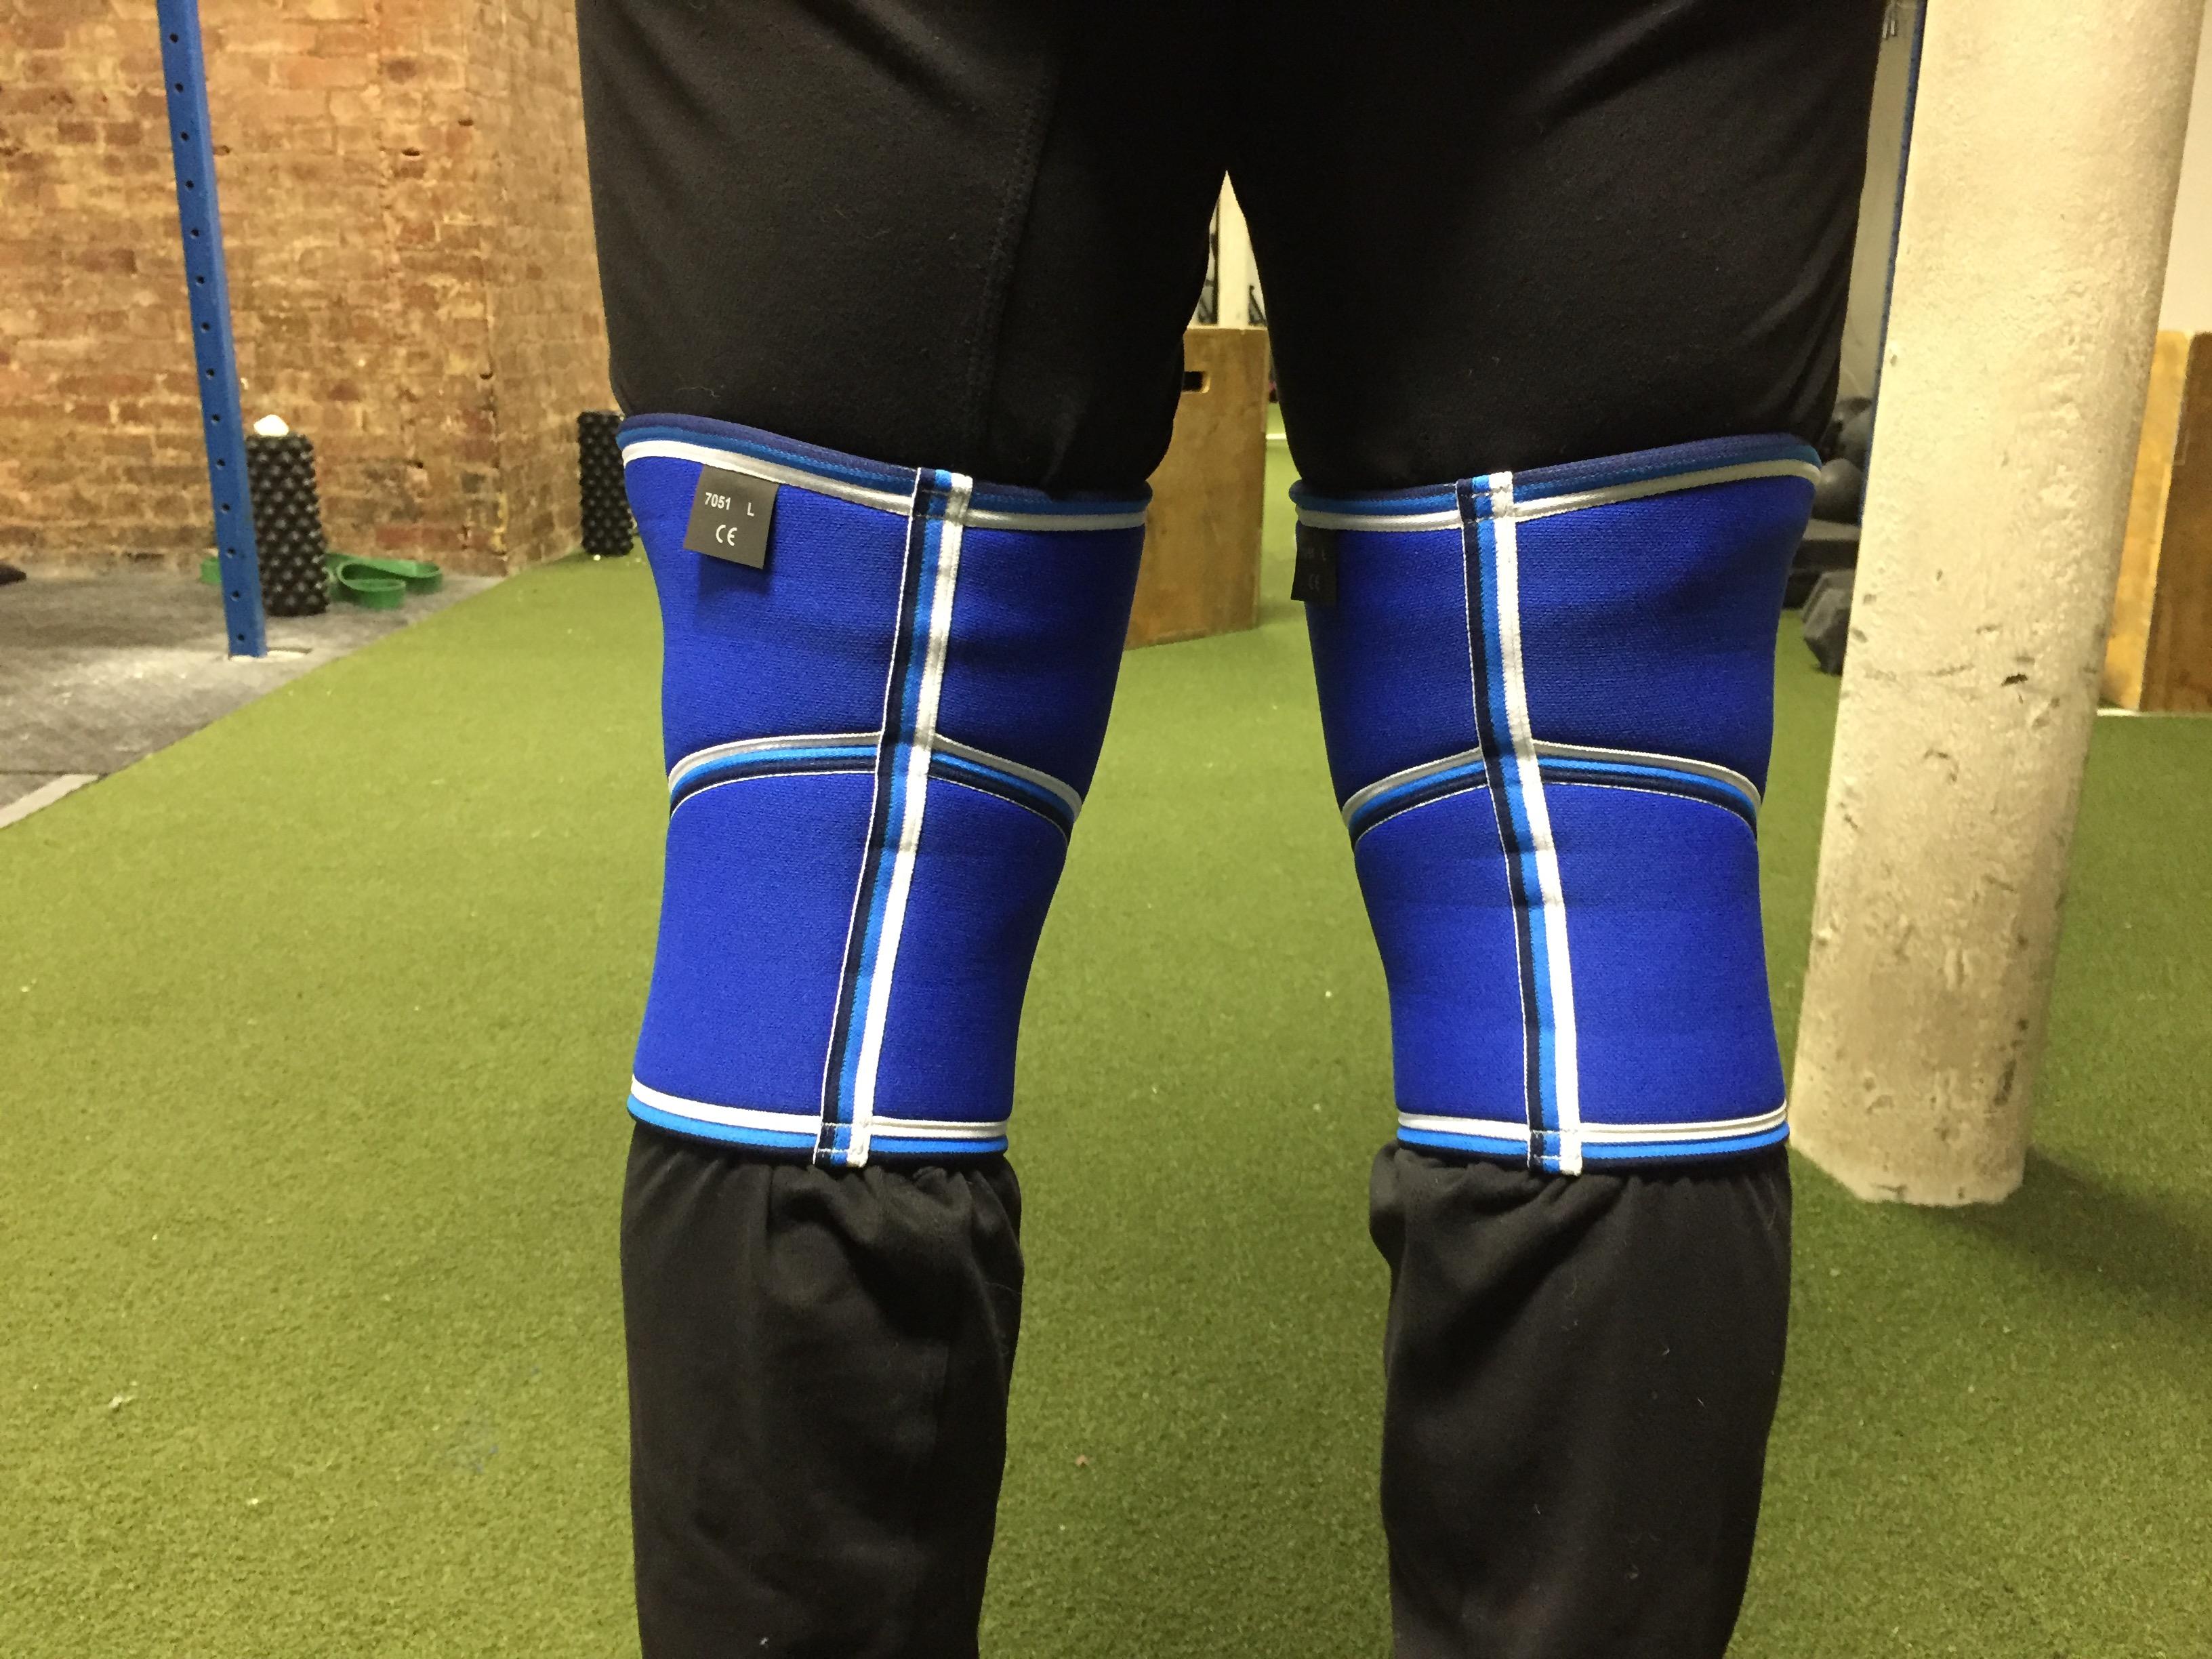 Rehband 7mm Knee Sleeves Sizing